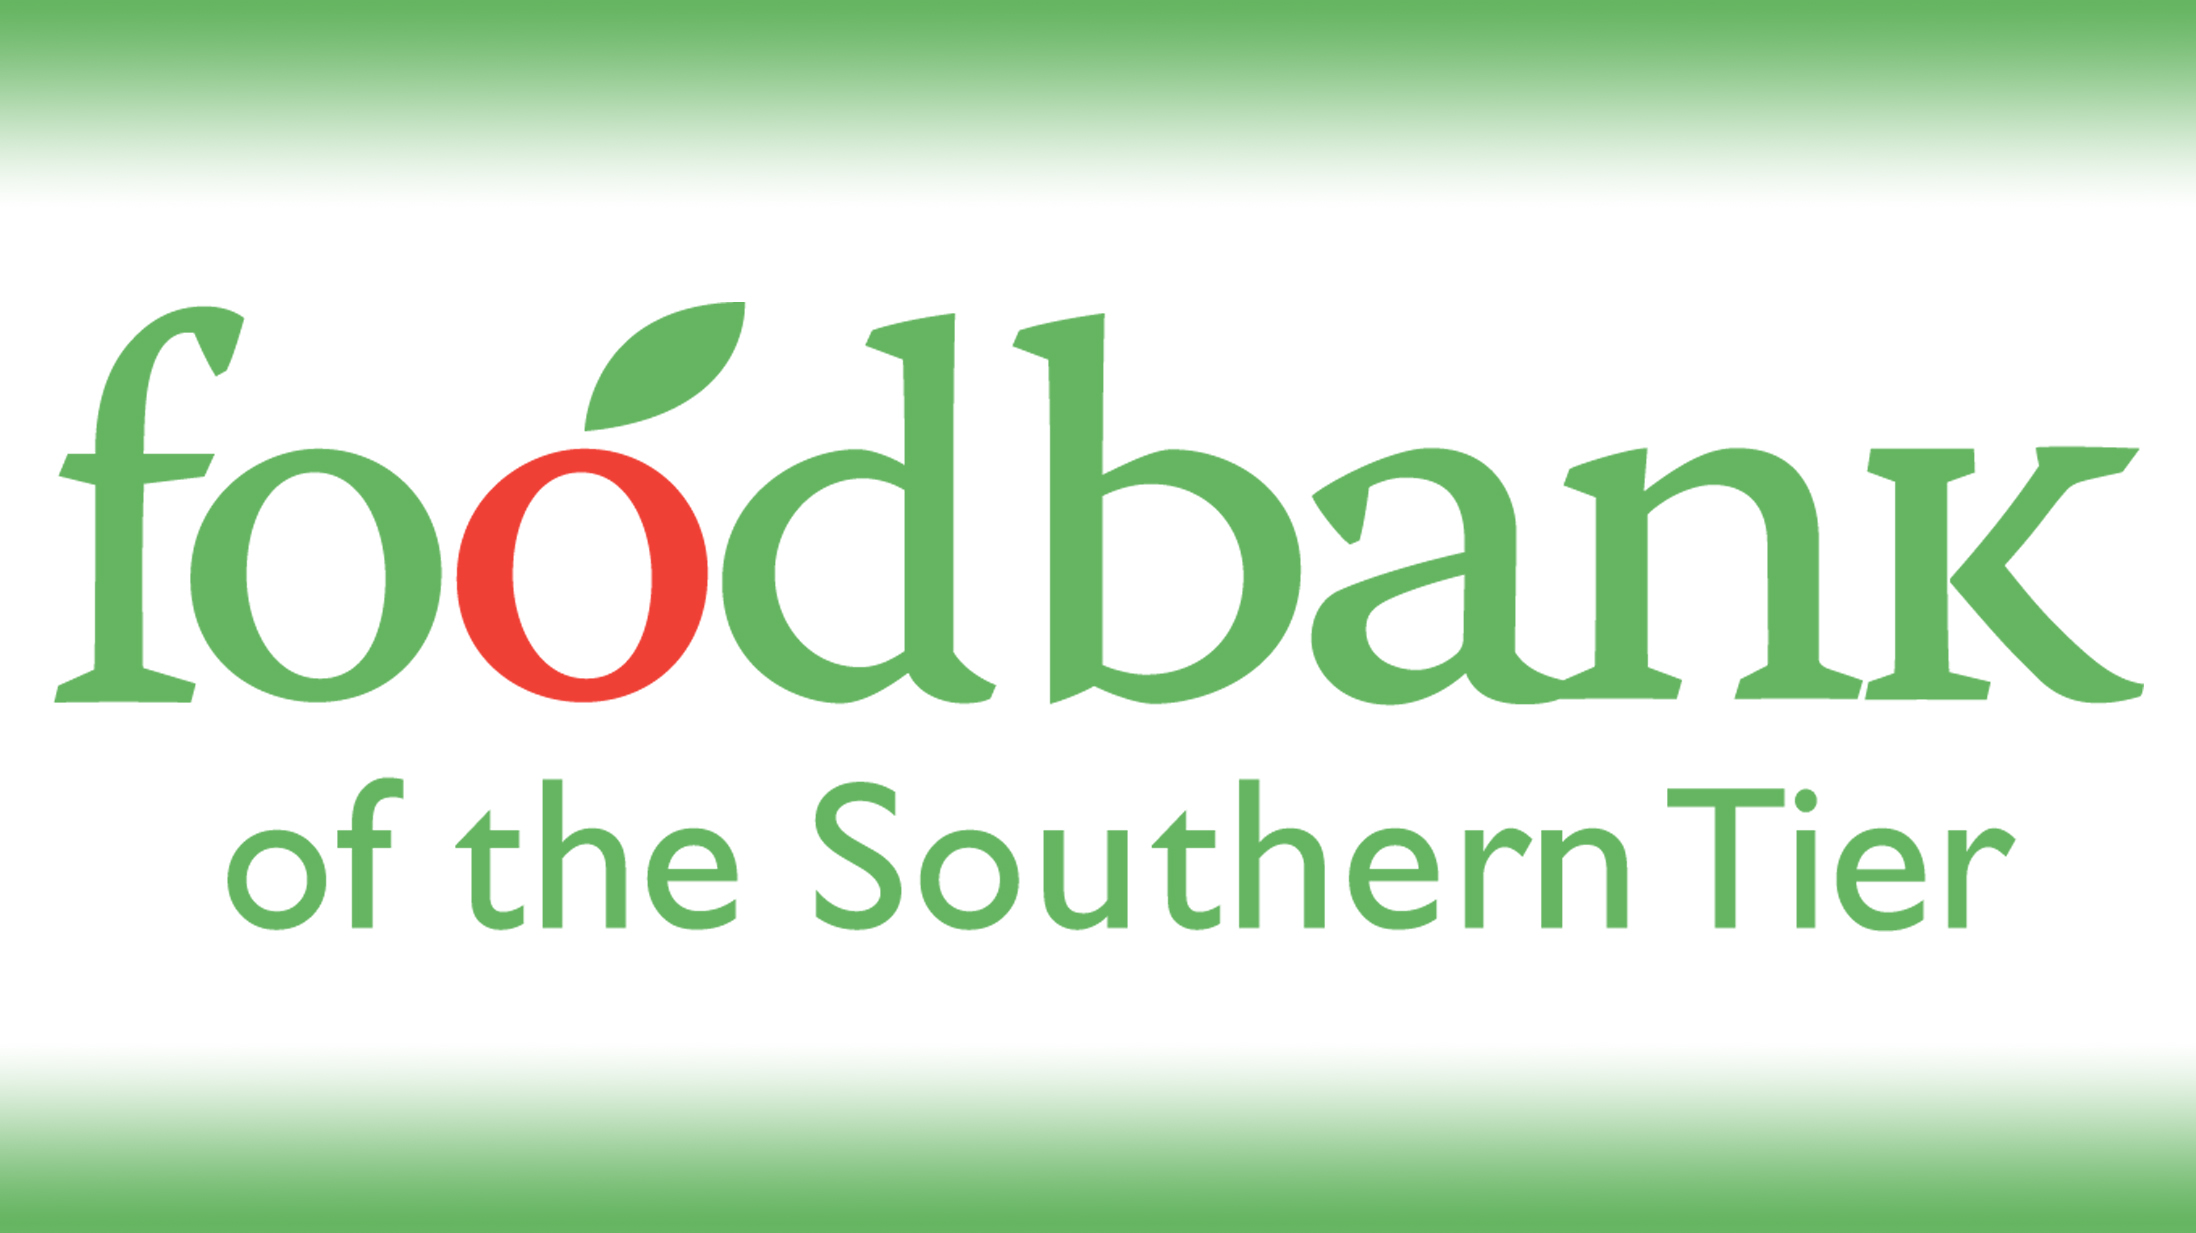 Food Bank OTST 09212015_1443044664518.jpg